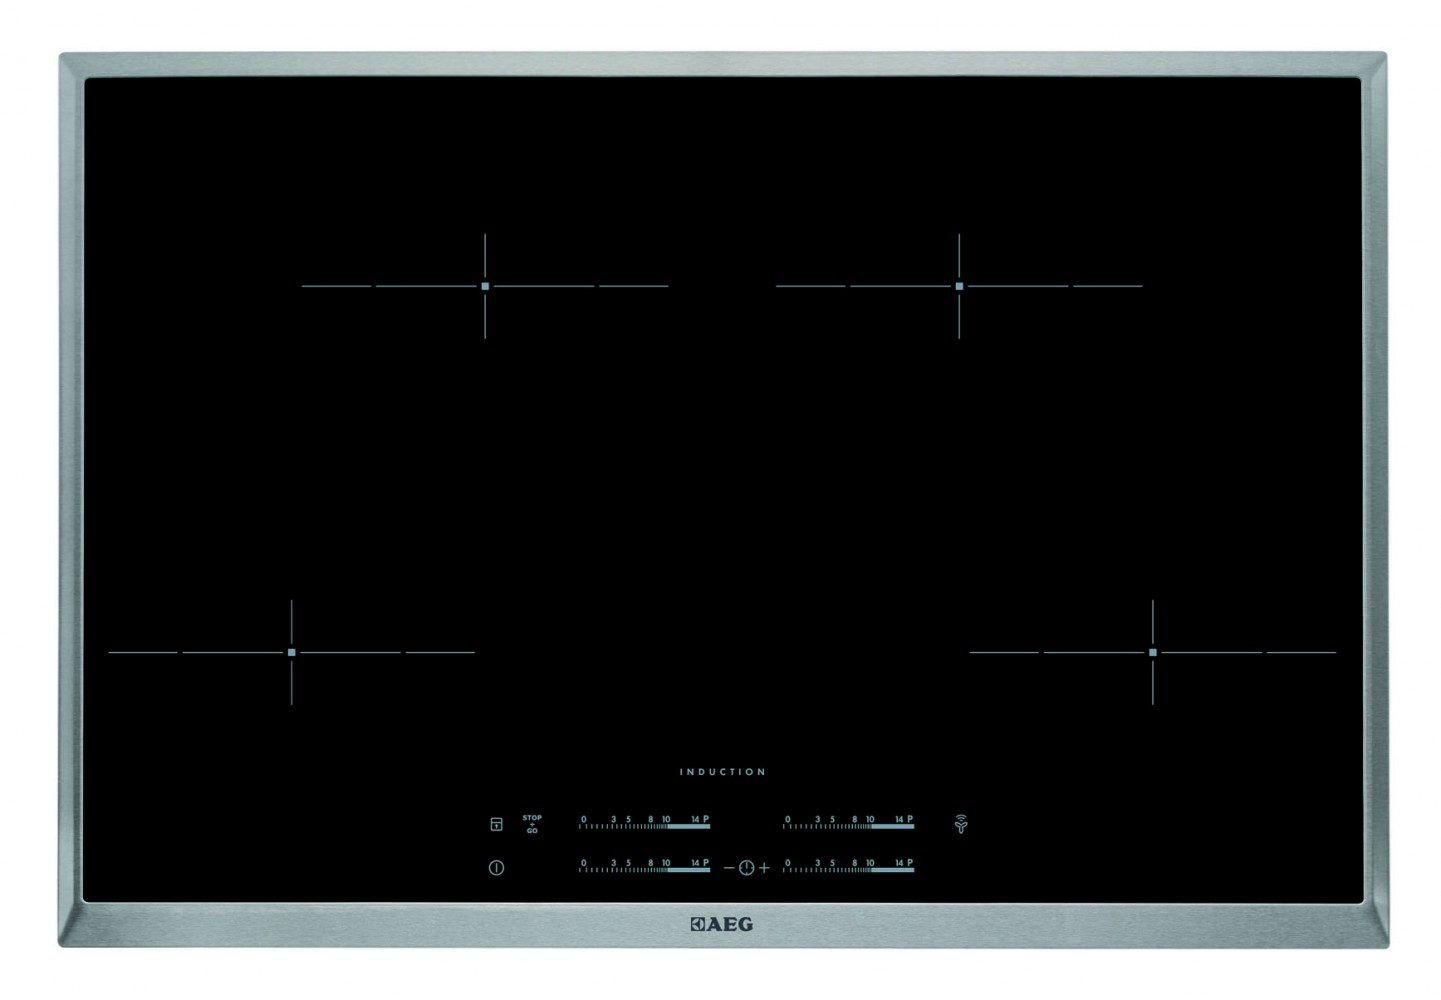 Aeg hdm 54108 xb induktionskochfeld 4x maxisense for Aeg maxisense